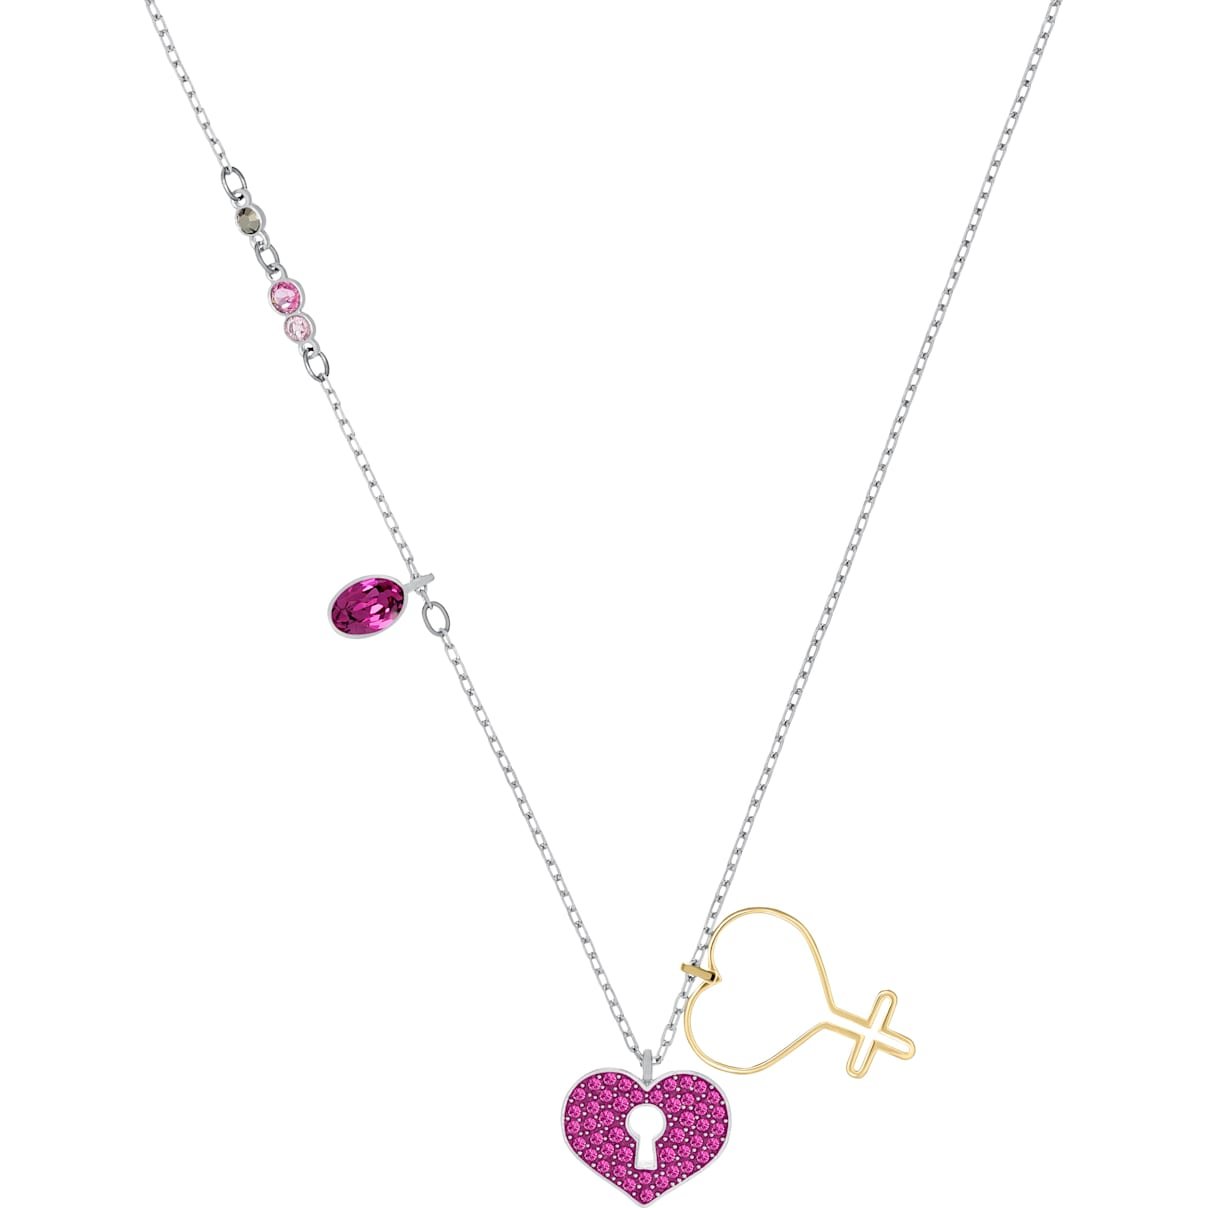 Swarovski Mine Heart Necklace, Multi-colored, Mixed metal finish